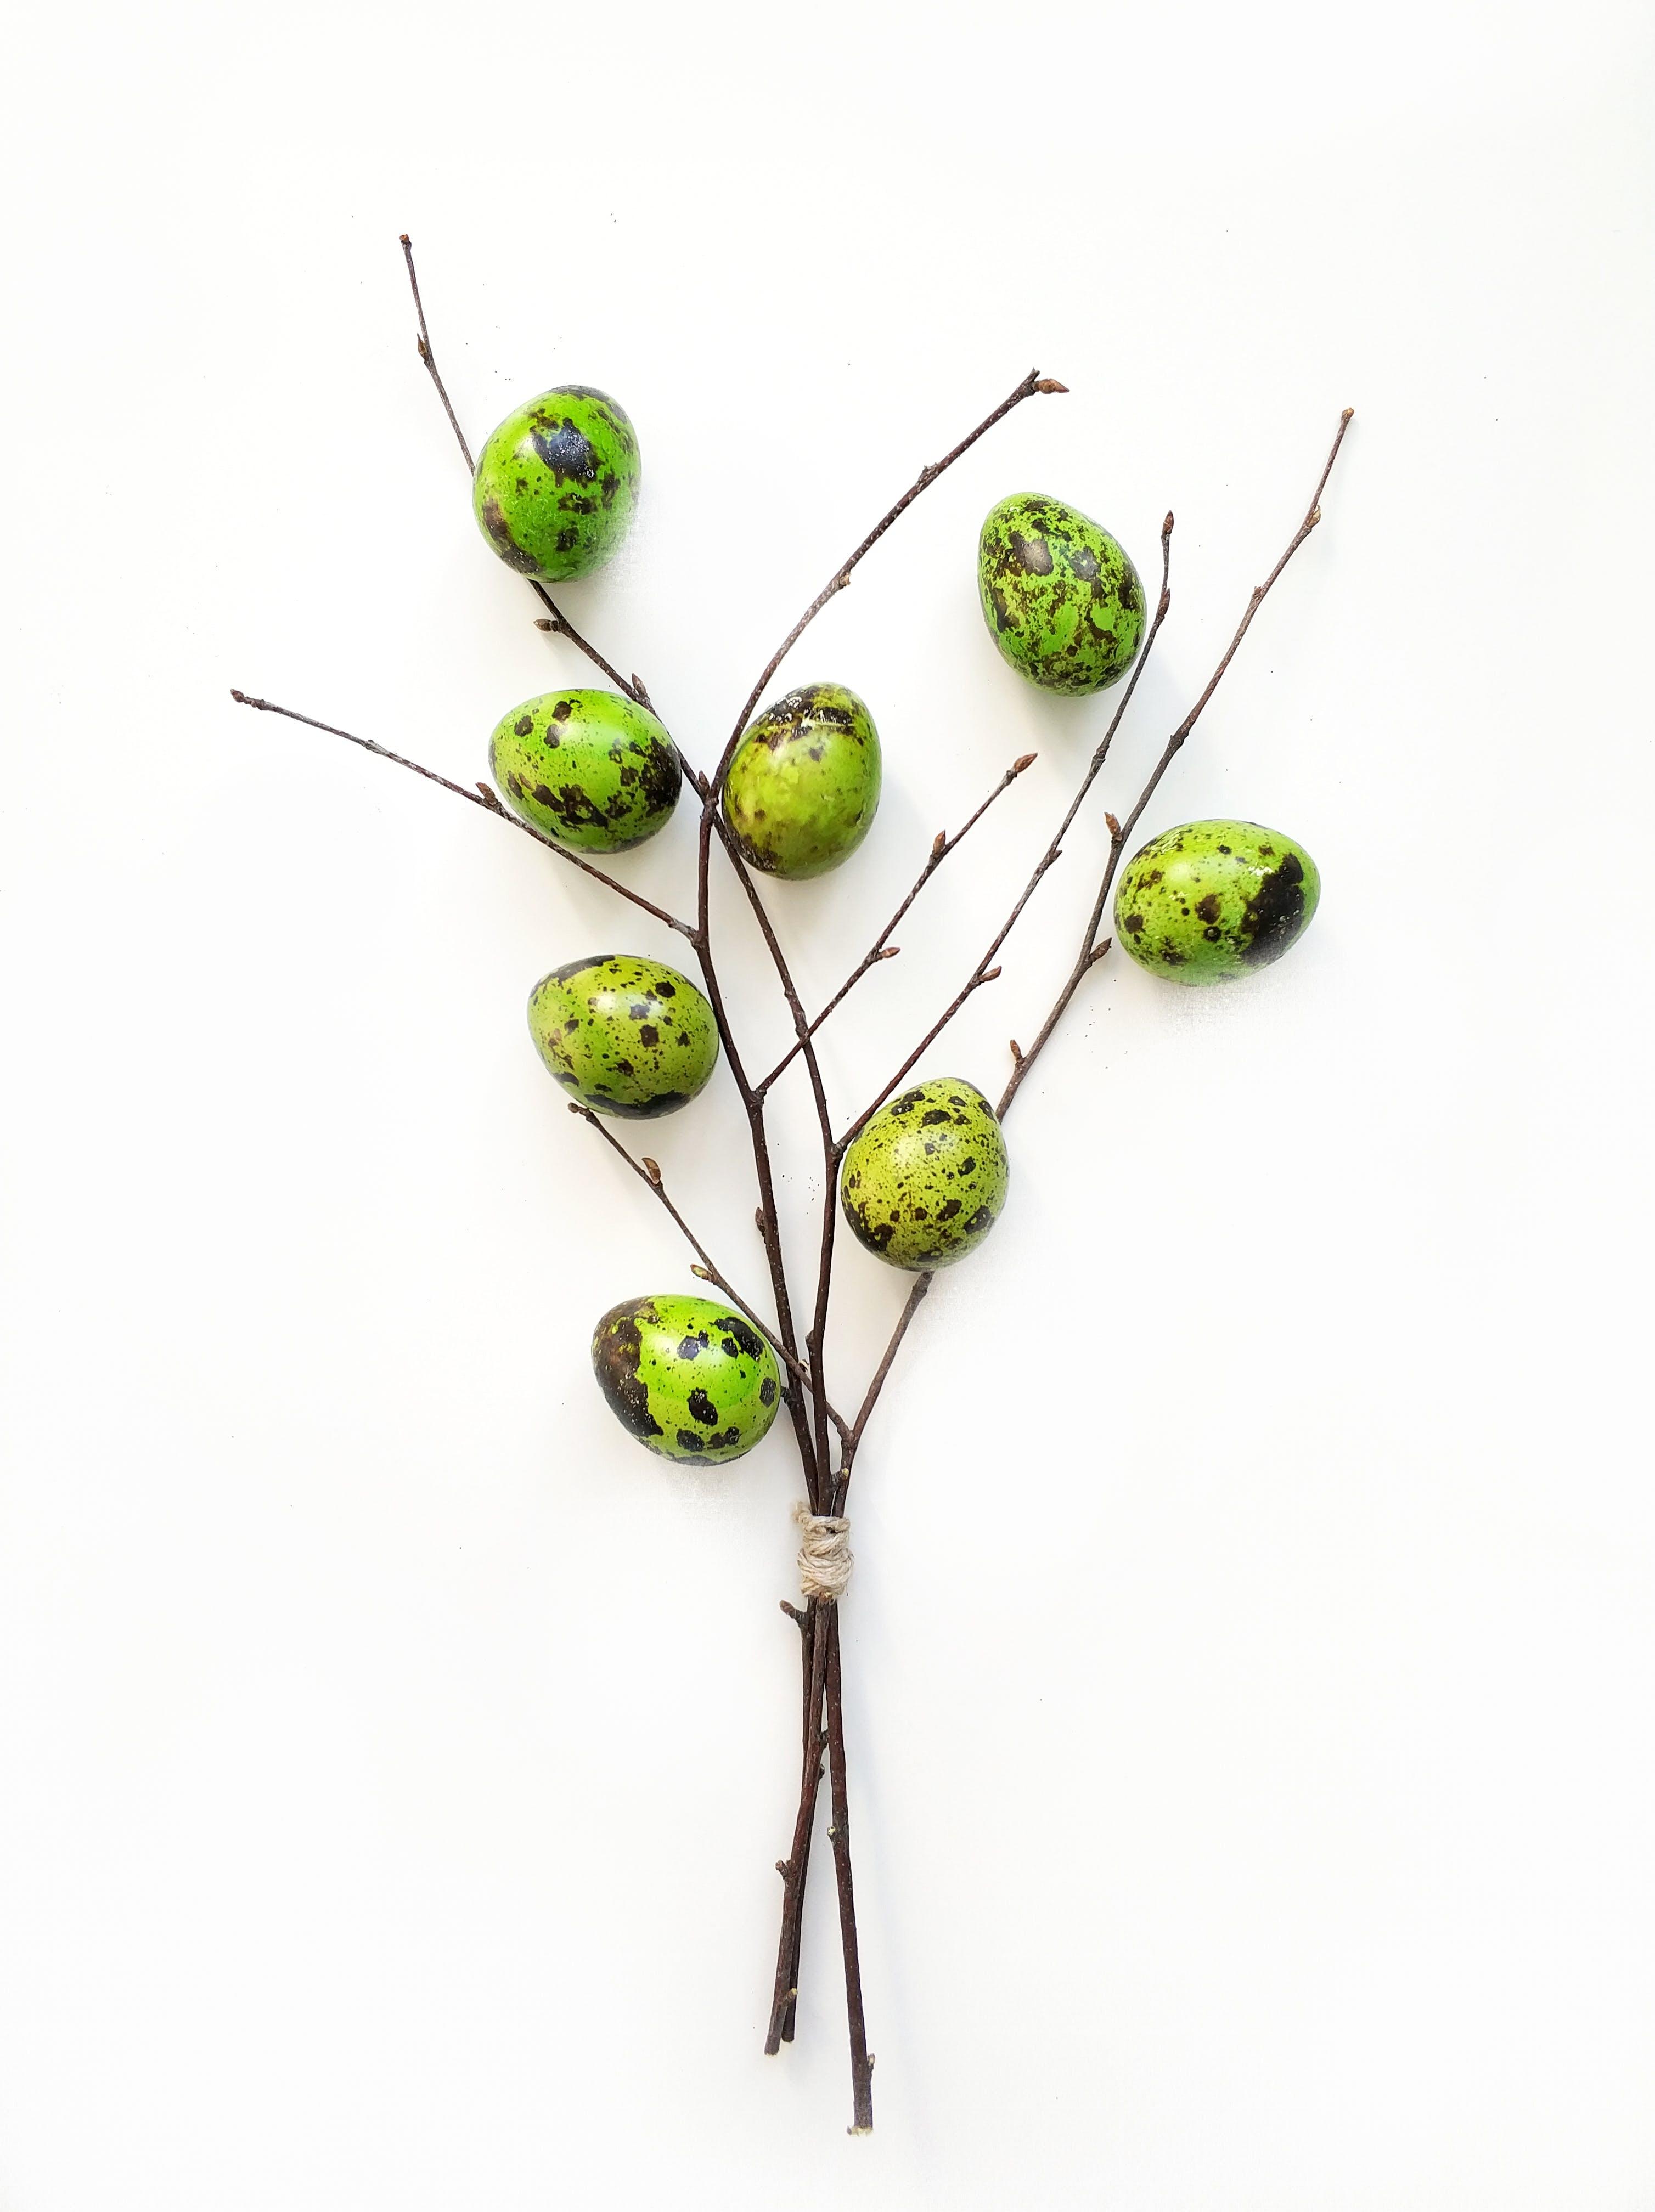 Green Quail Eggs on Tree Branch